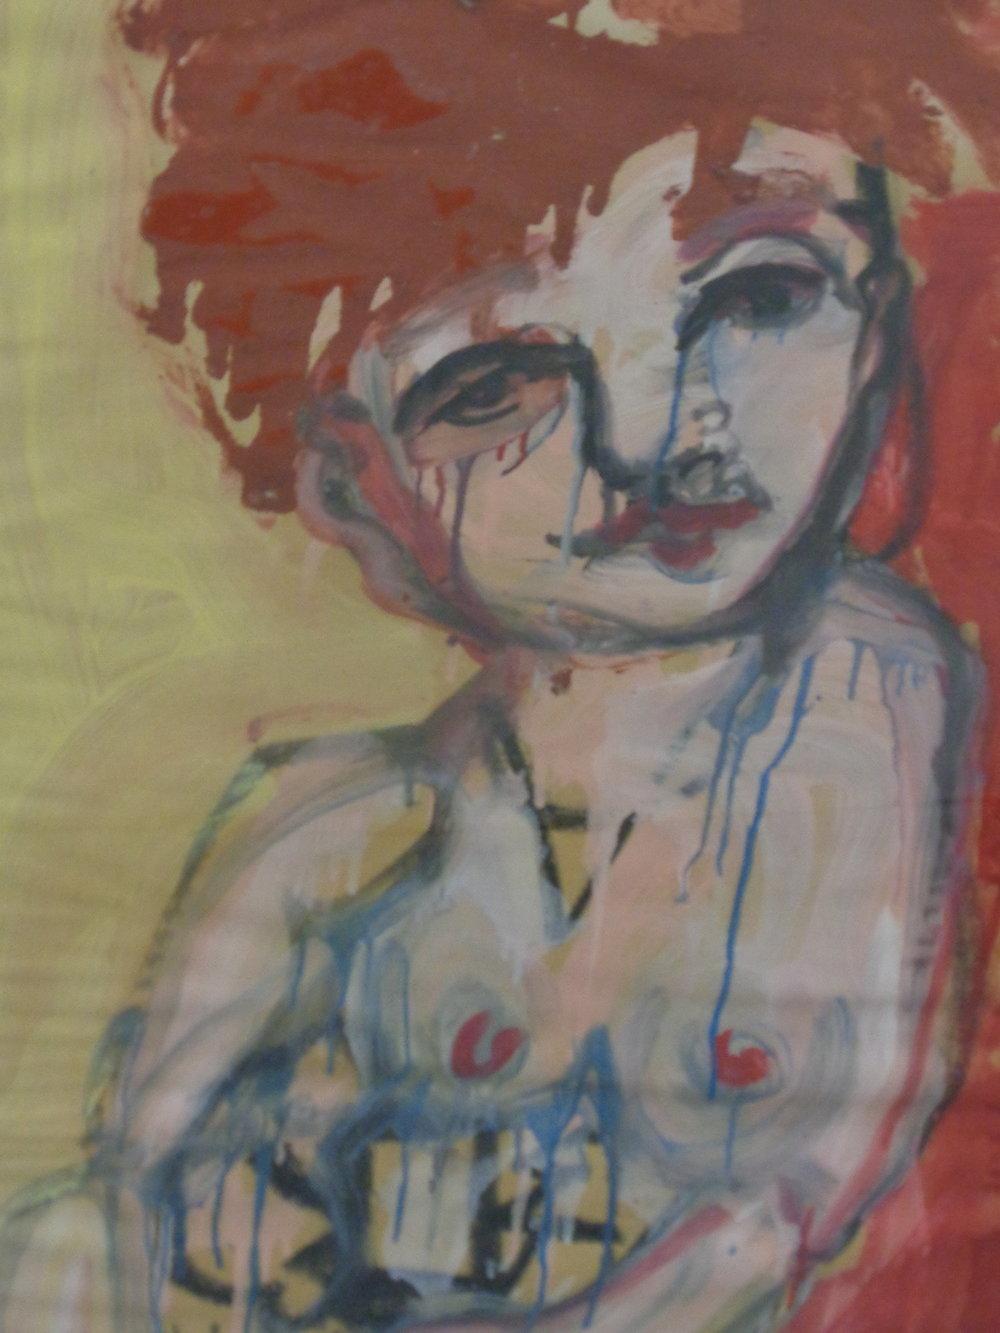 Siobahn Posing - Oil on paper 2013